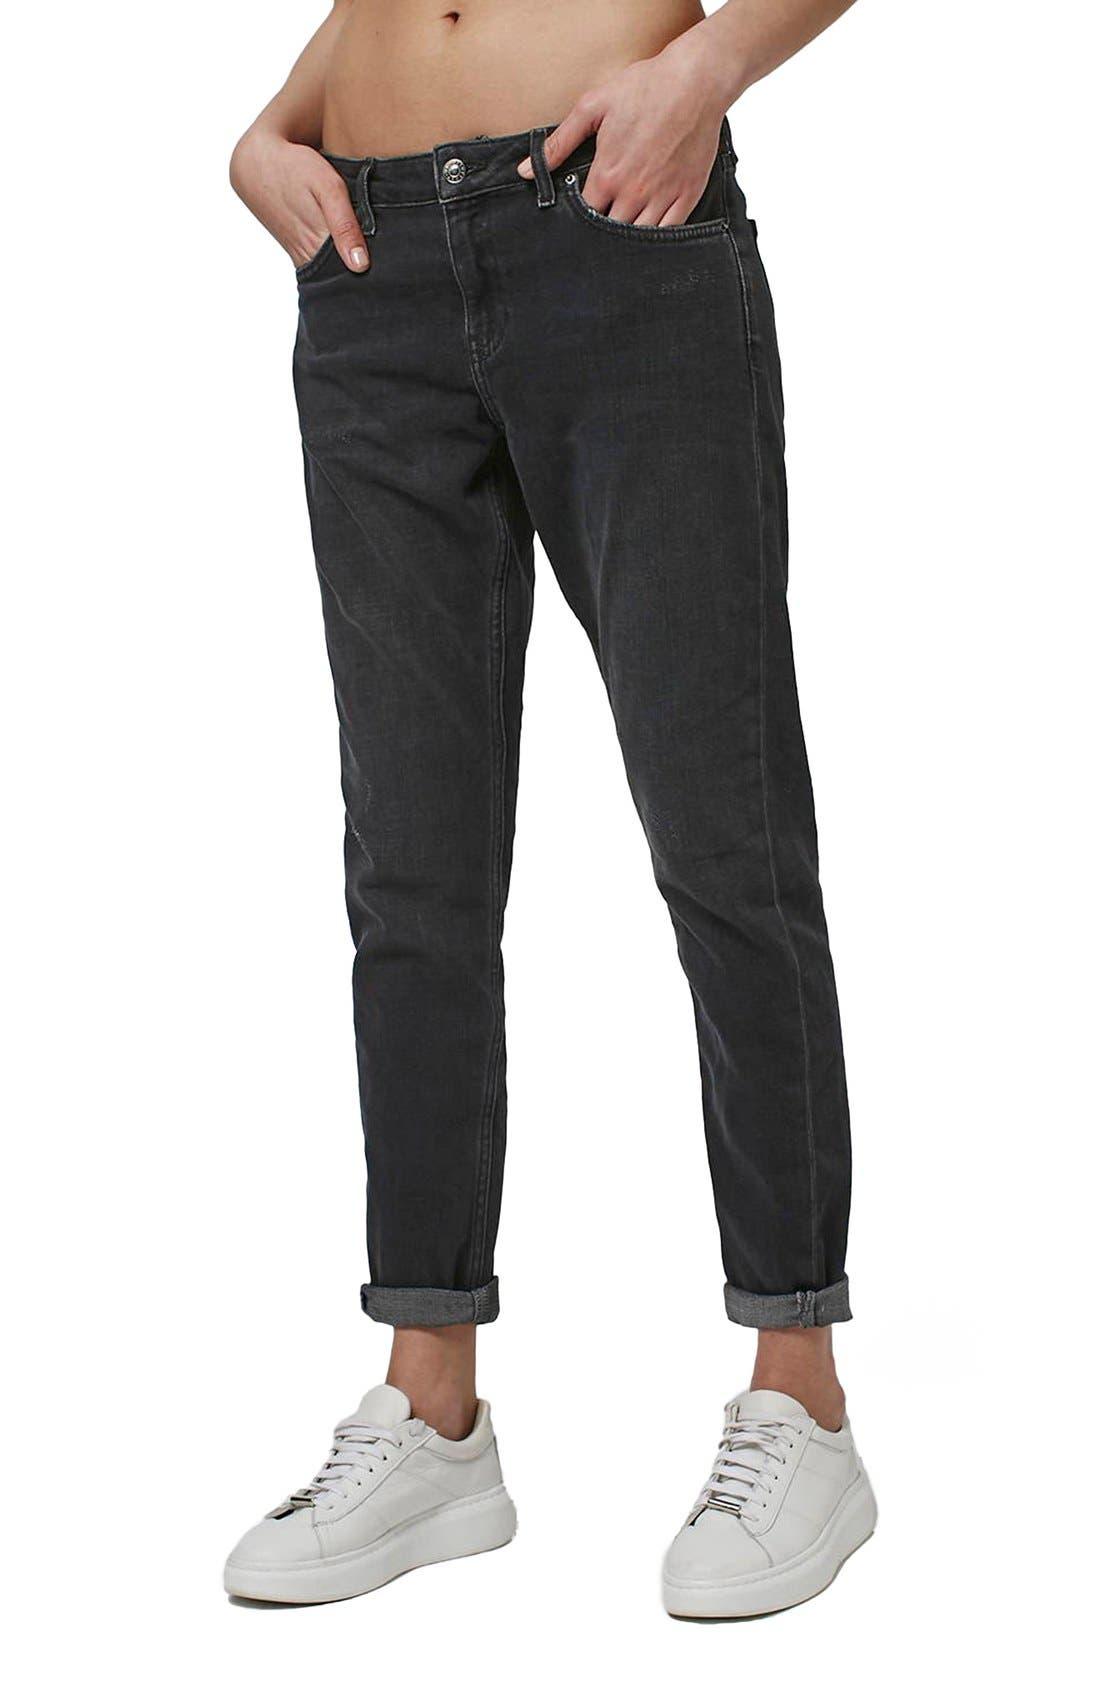 Alternate Image 1 Selected - Topshop Moto 'Lucas' Slim Boyfriend Jeans